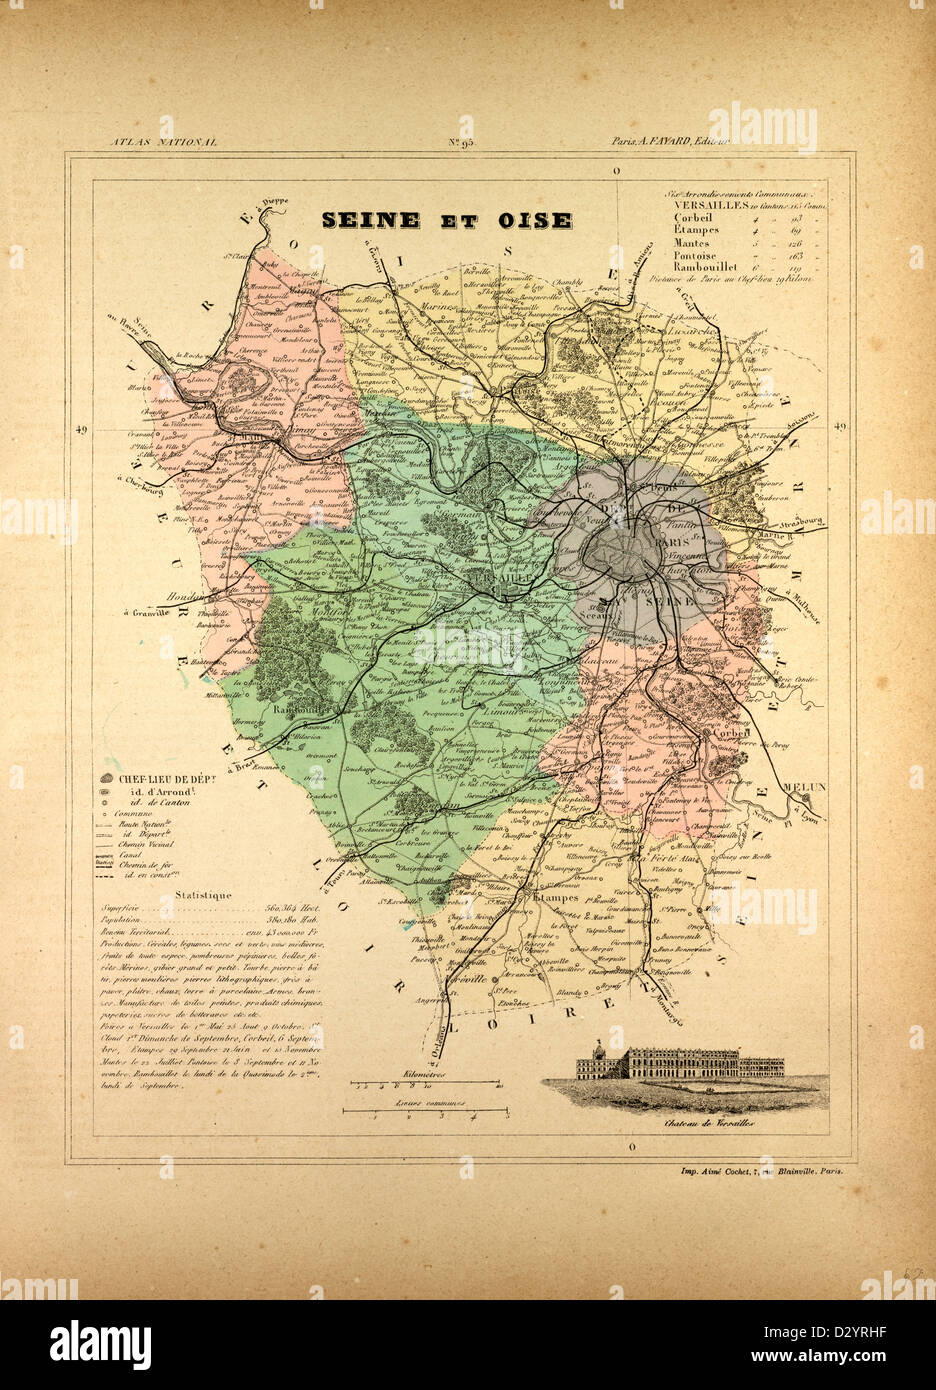 MAP OF SEINE ET OISE FRANCE - Stock Image